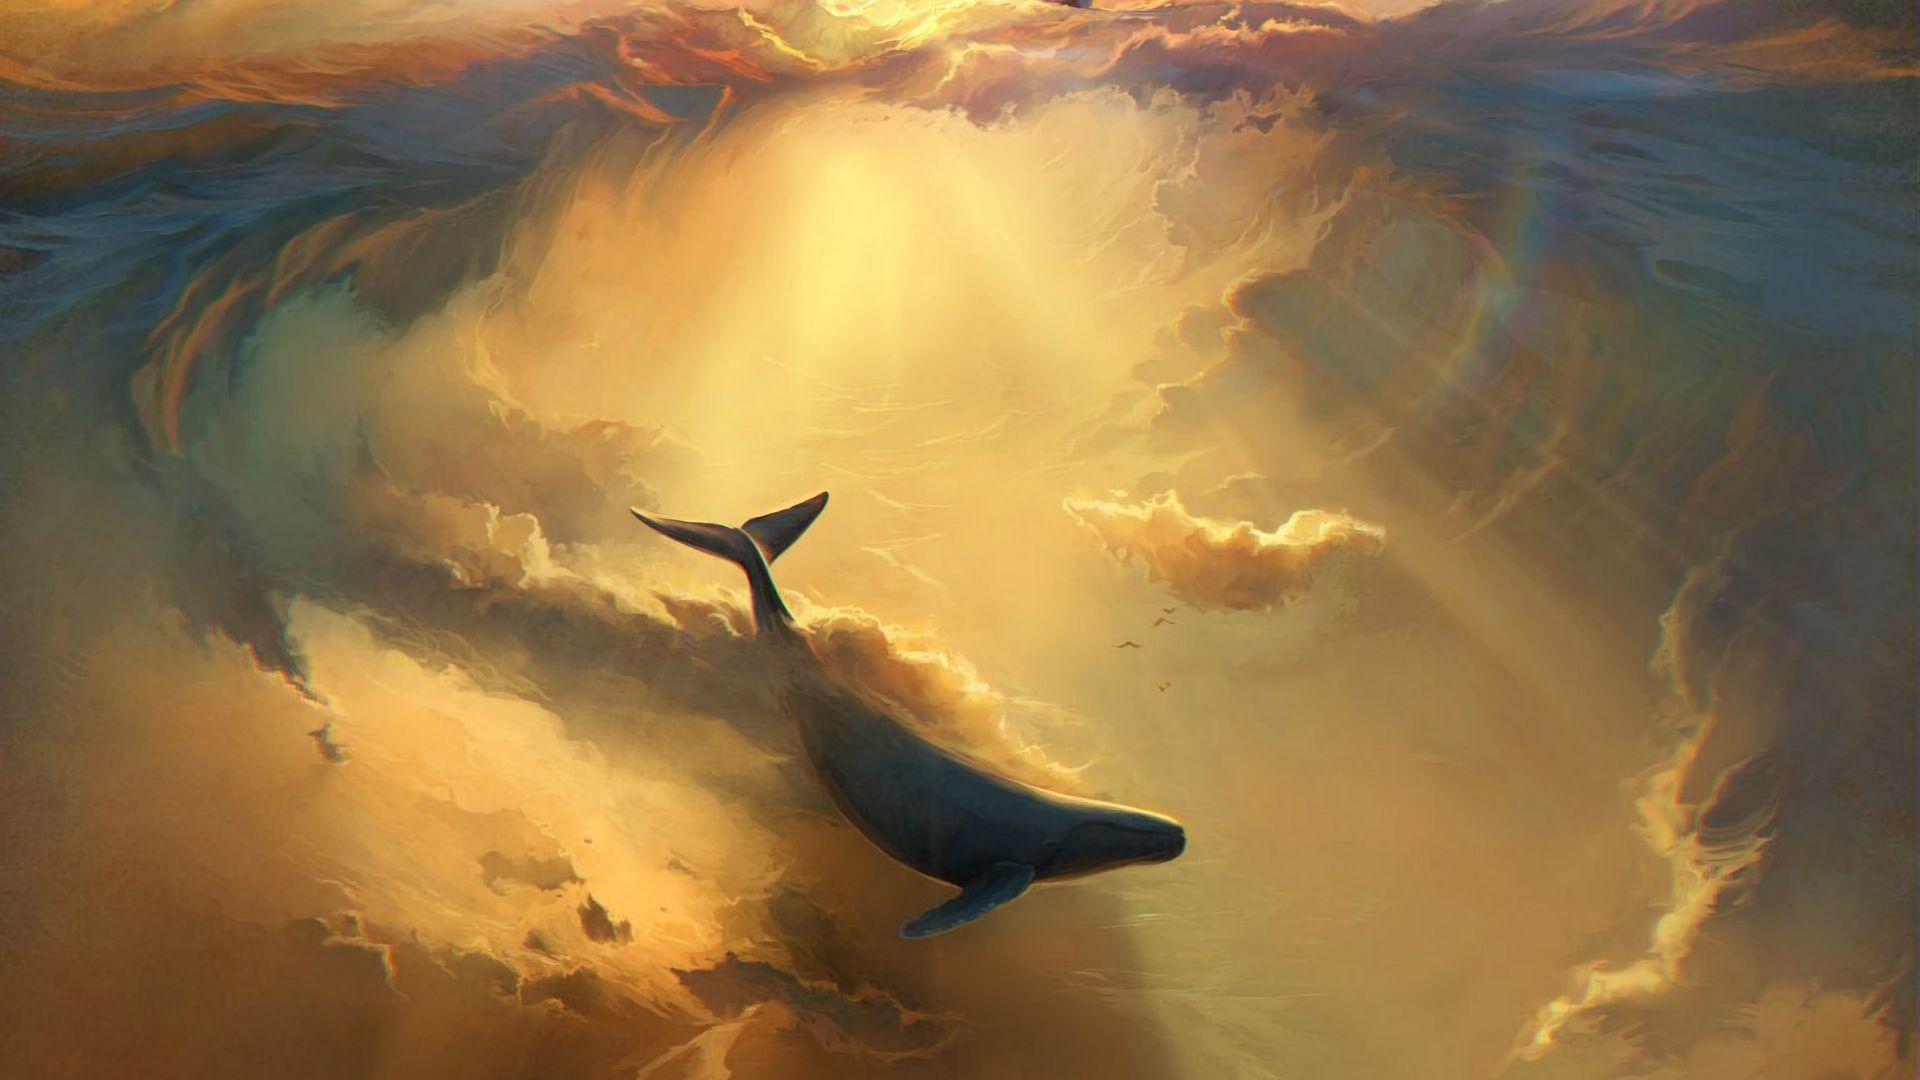 1920x1080 Wallpaper shark, dolphin, sea, art, underwater world